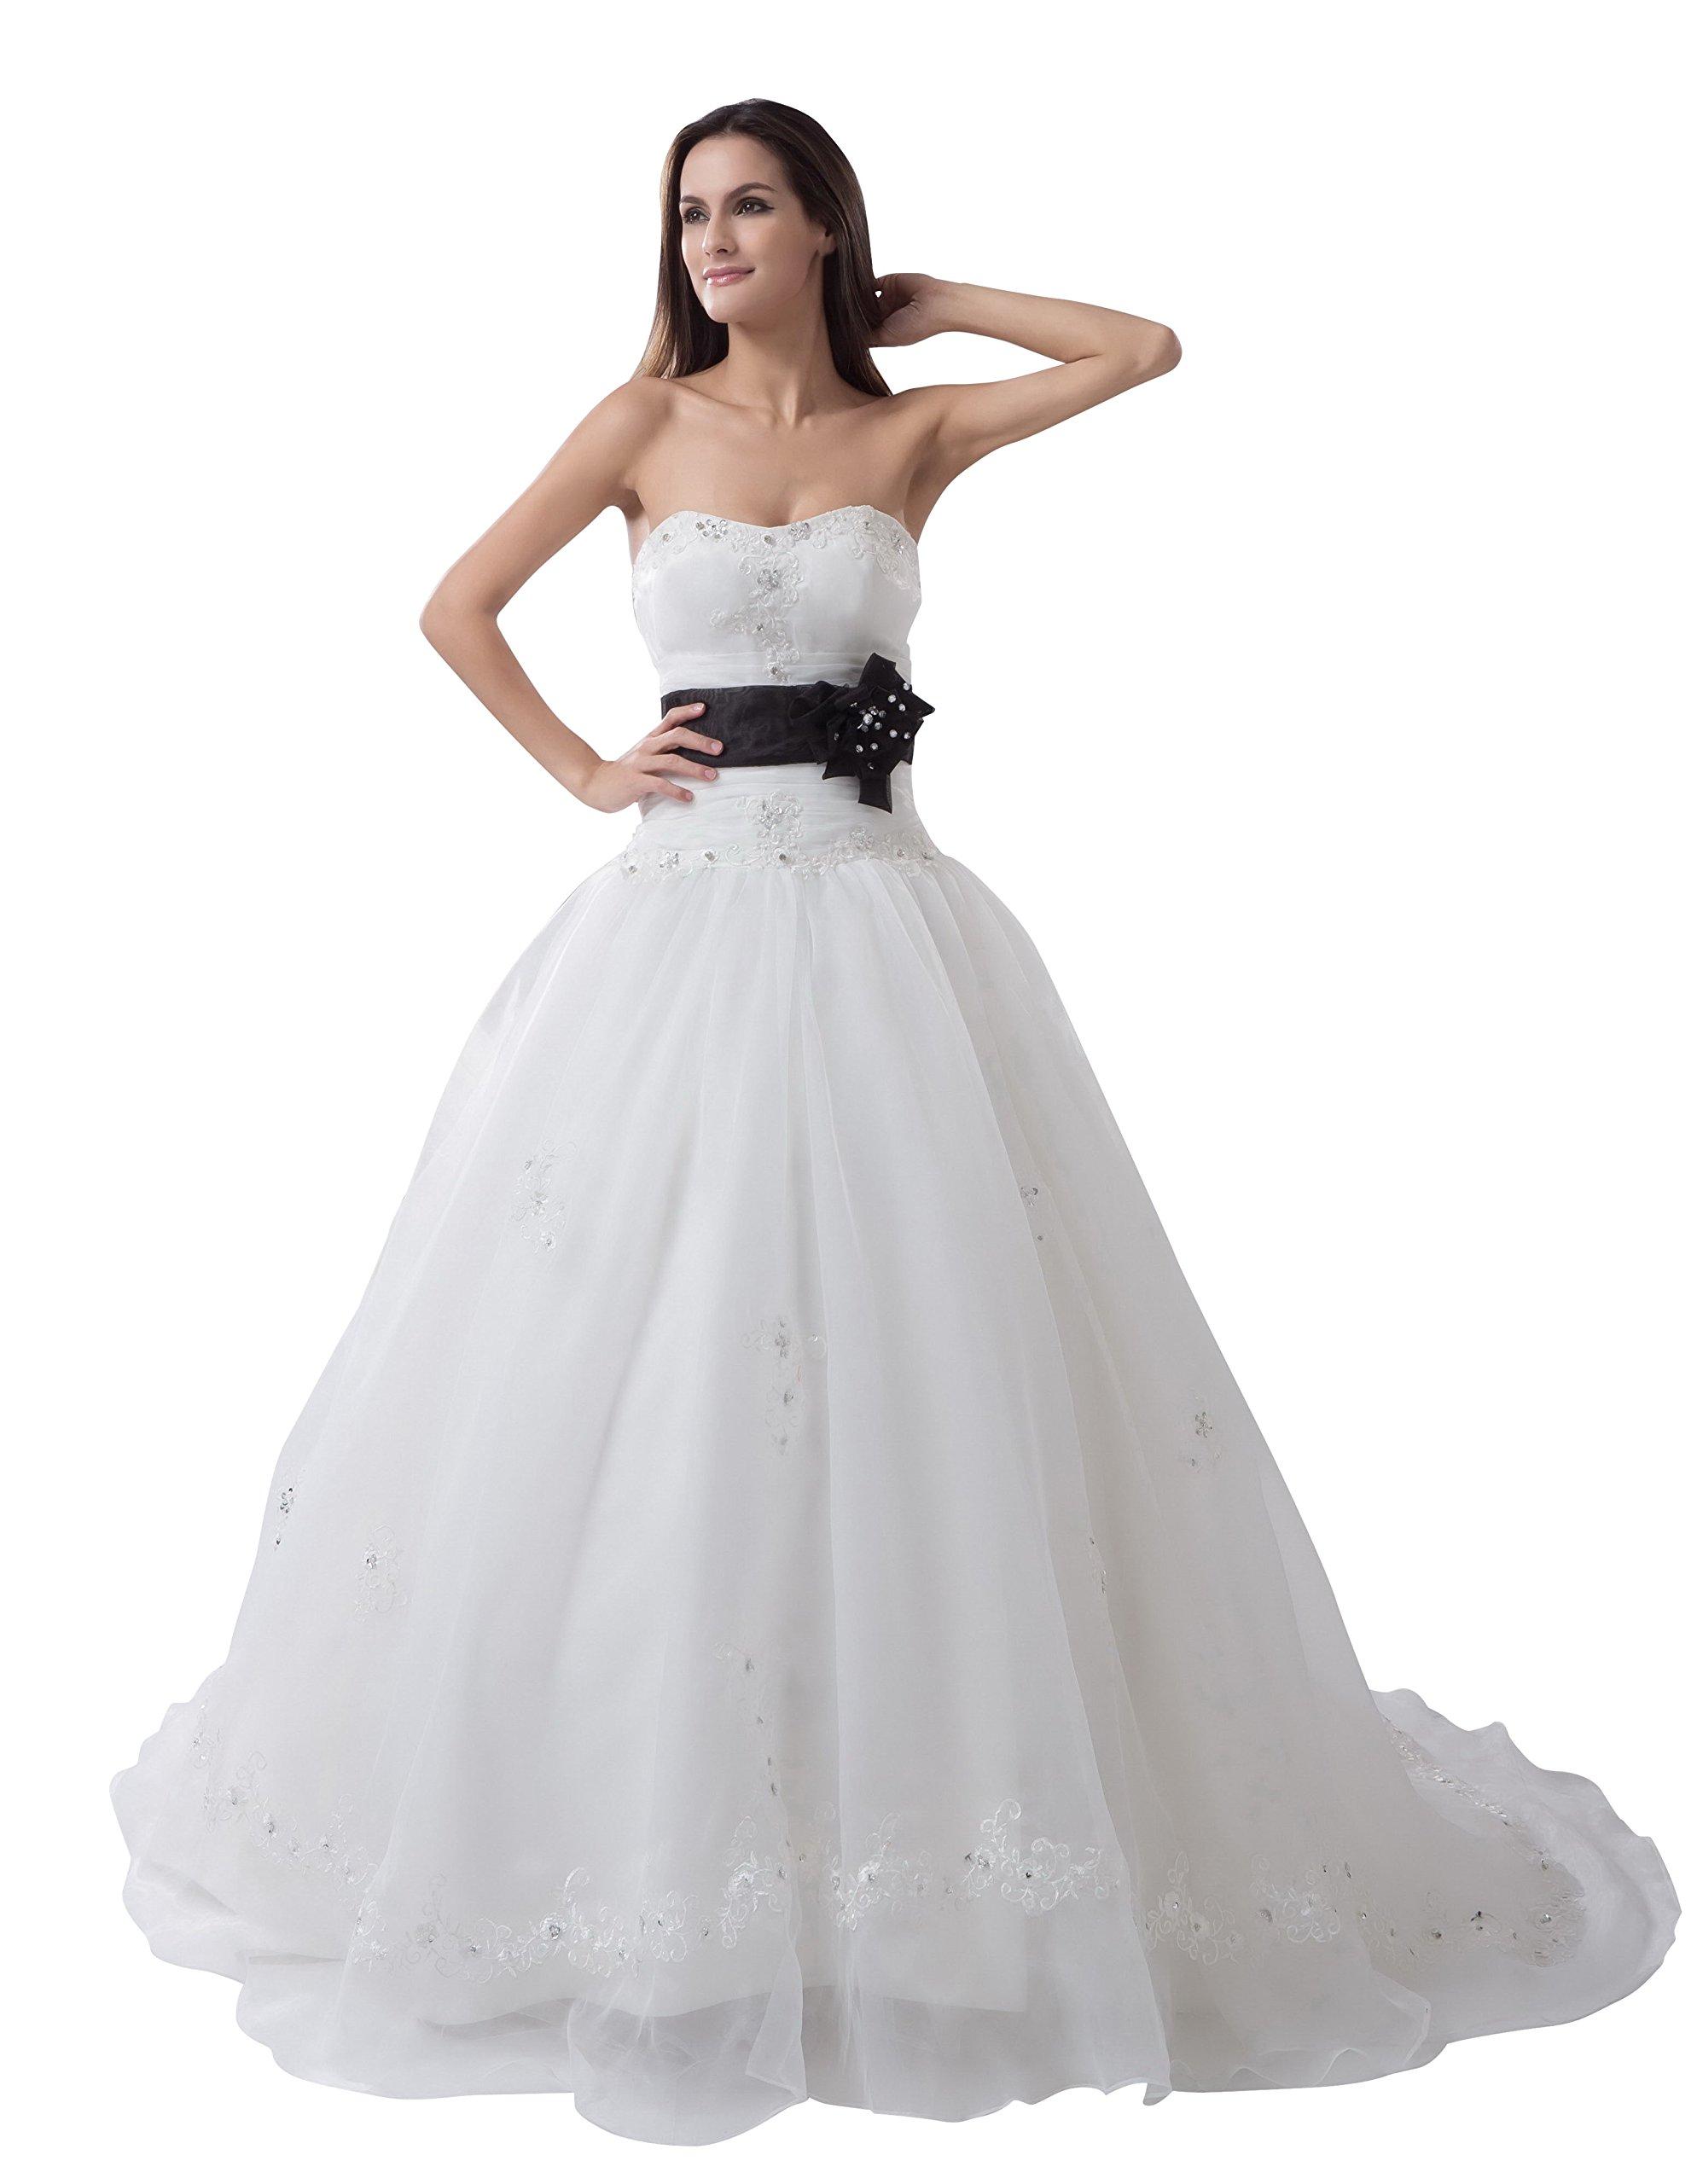 Vogue007 Womens Strapless Taffeta Satin Wedding Dress with Floral, White, 18